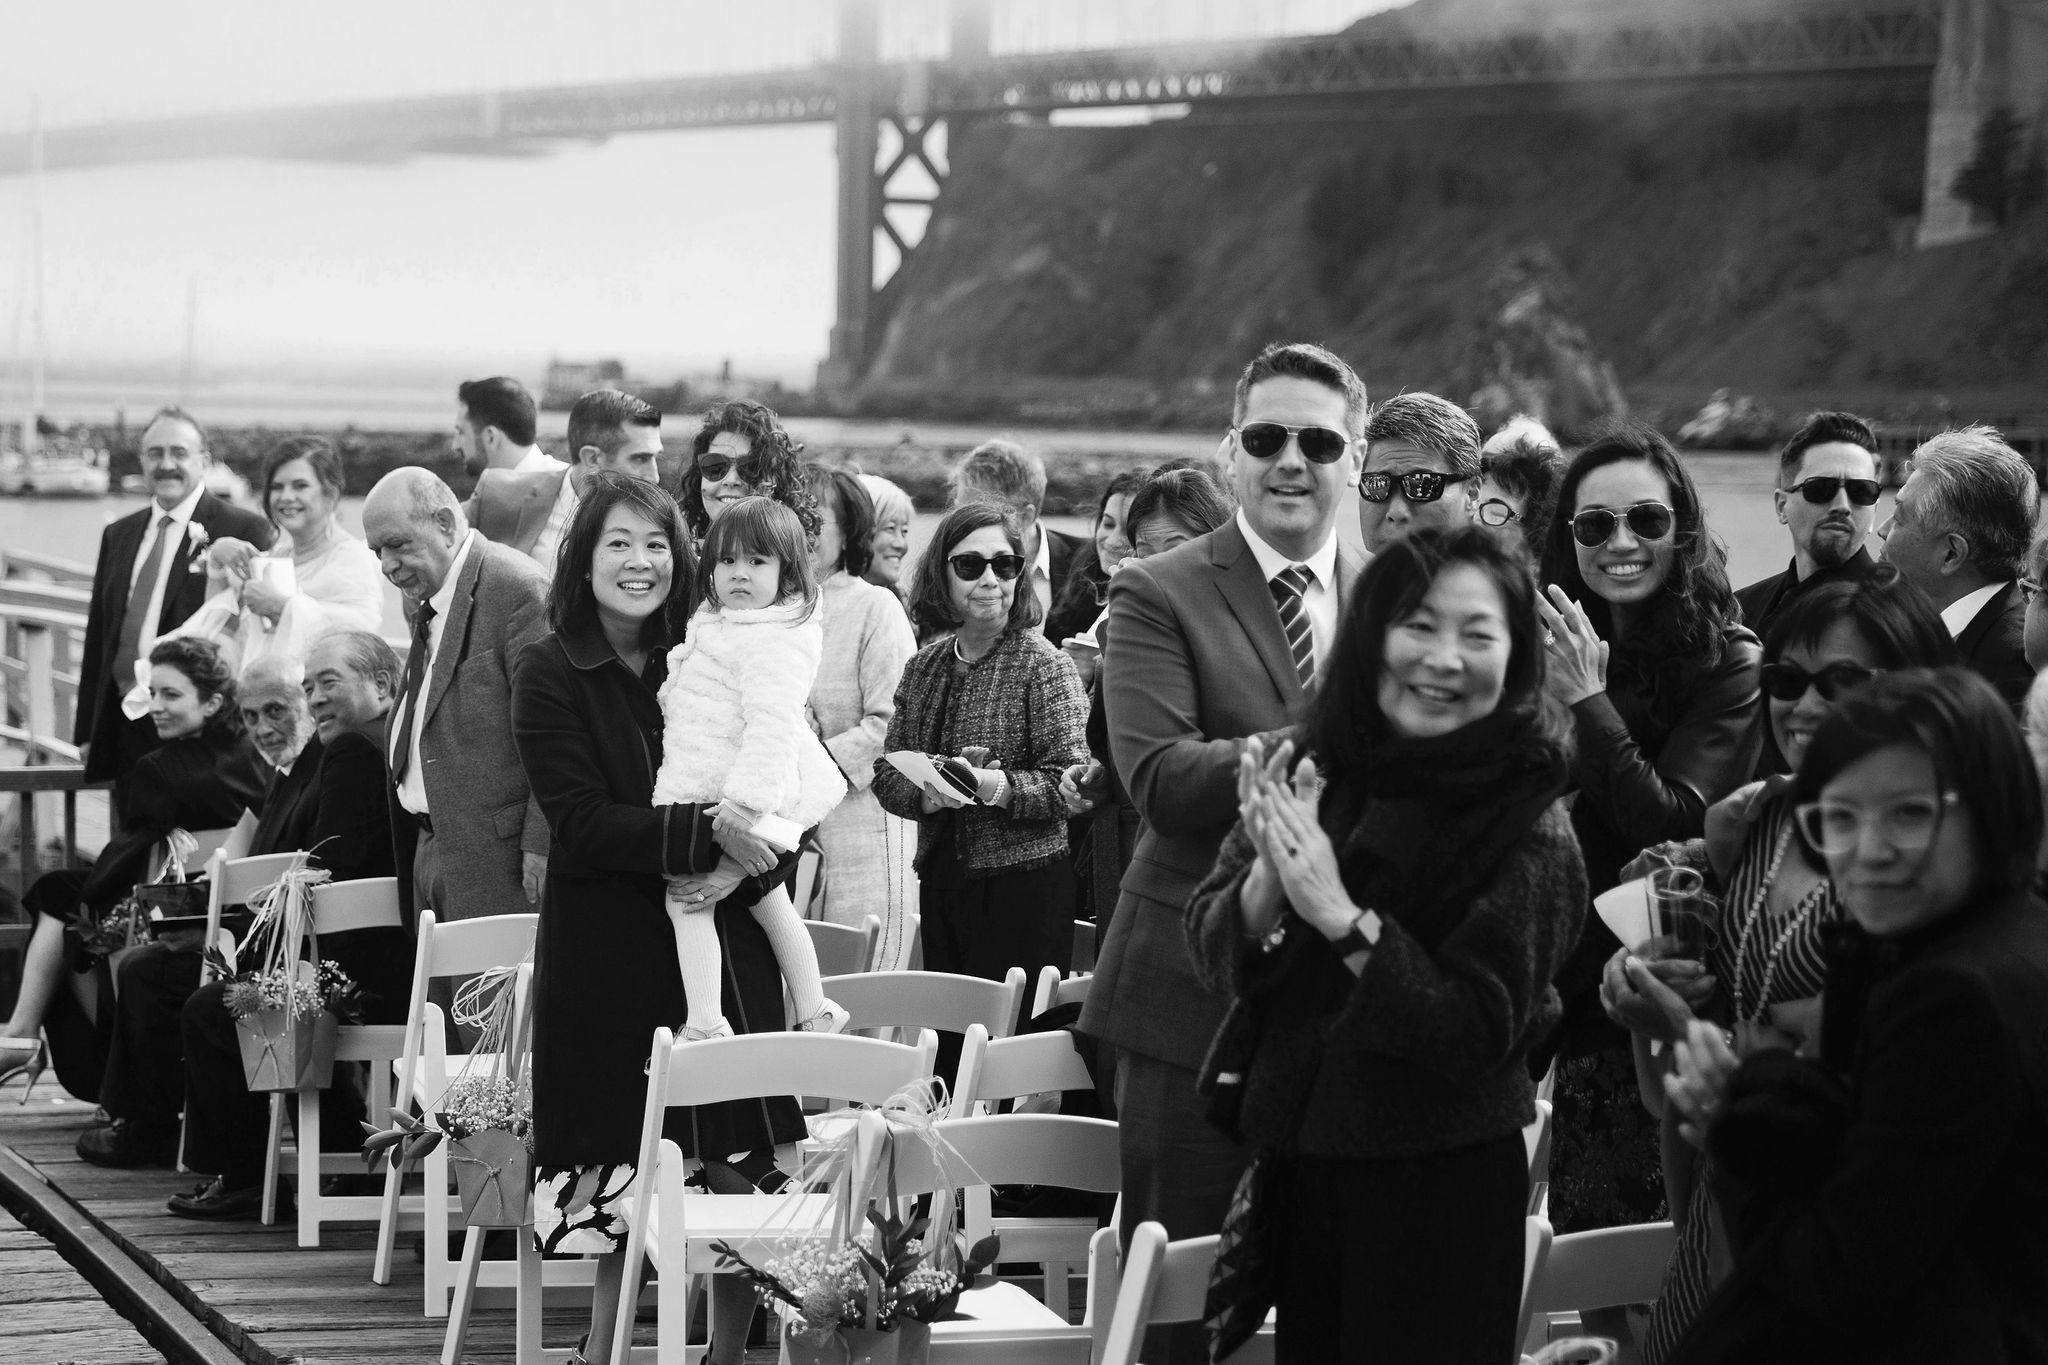 Presidio-Yacht-Club-Wedding-047.JPG